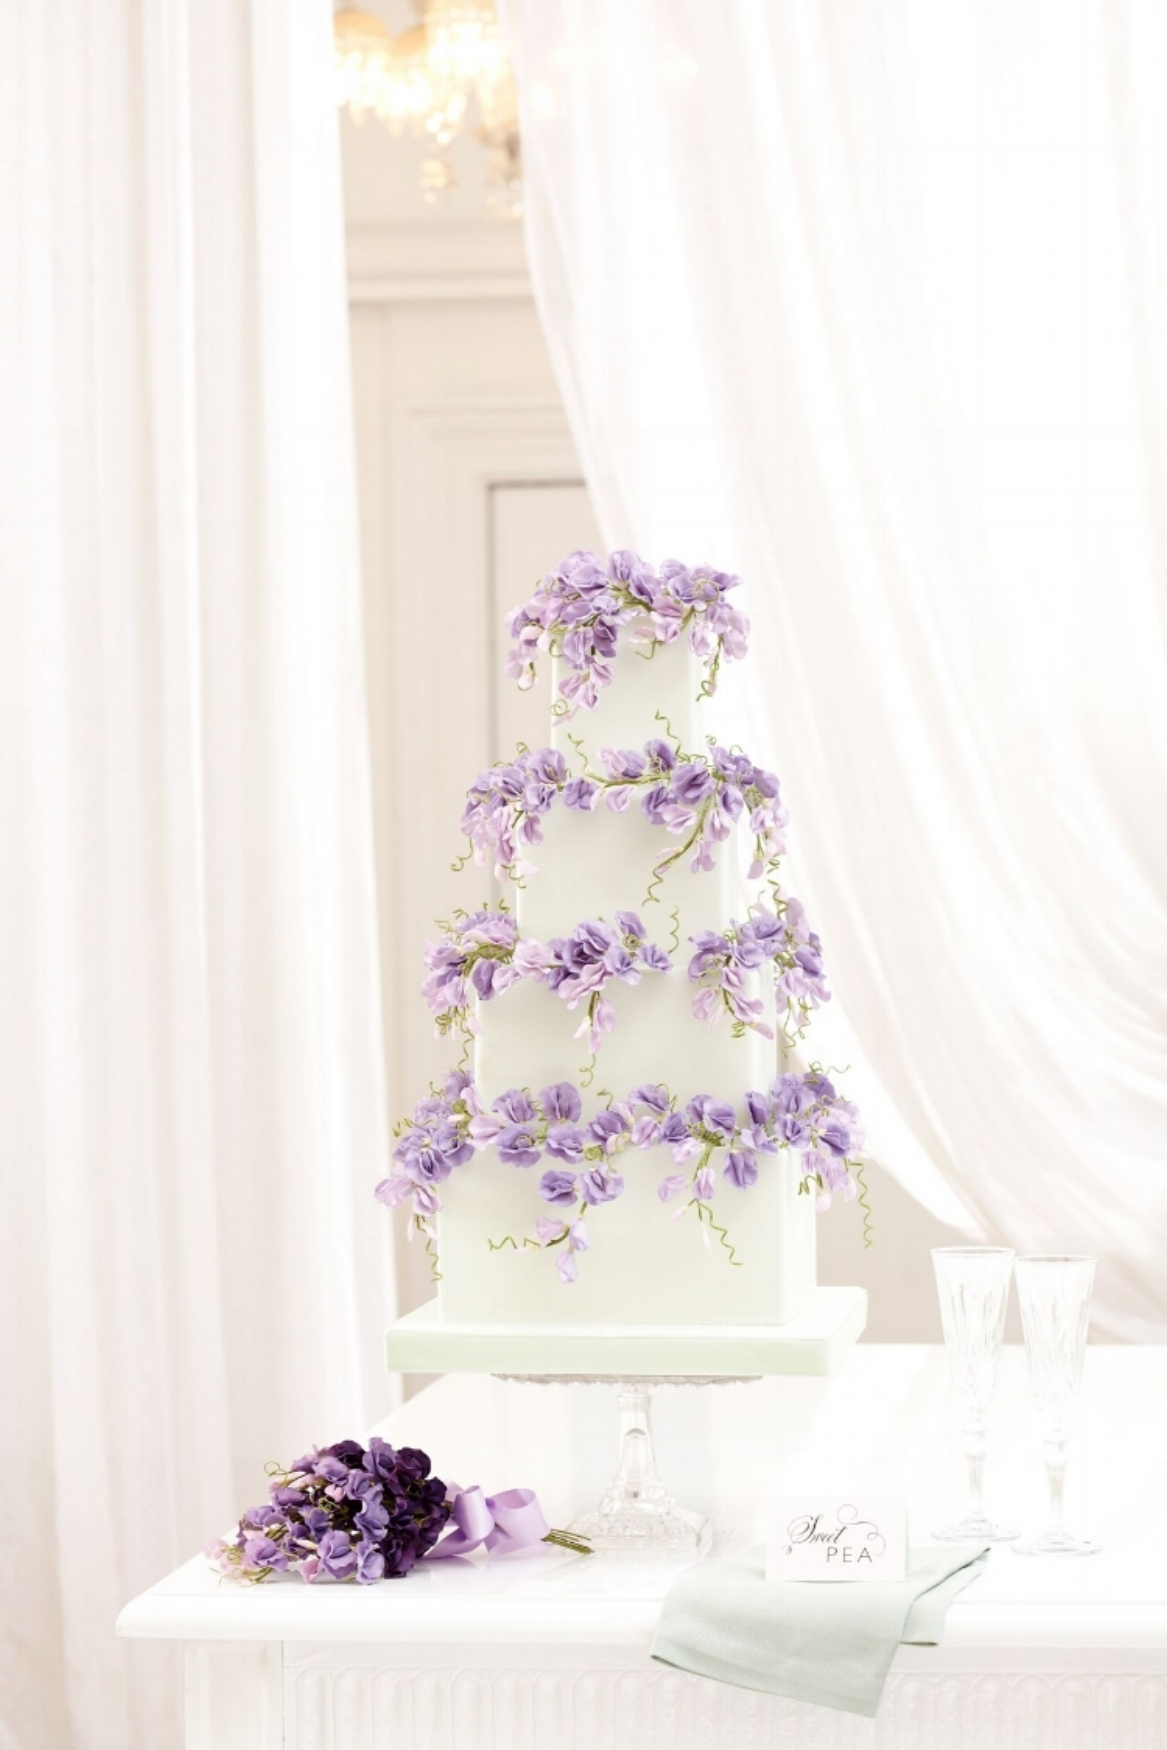 Peggy-Porschen_Floral-wedding-cake-collection_Purple-sweet-peas13001-brides-8may14_Georgia-Glynn-Smith_b.jpg